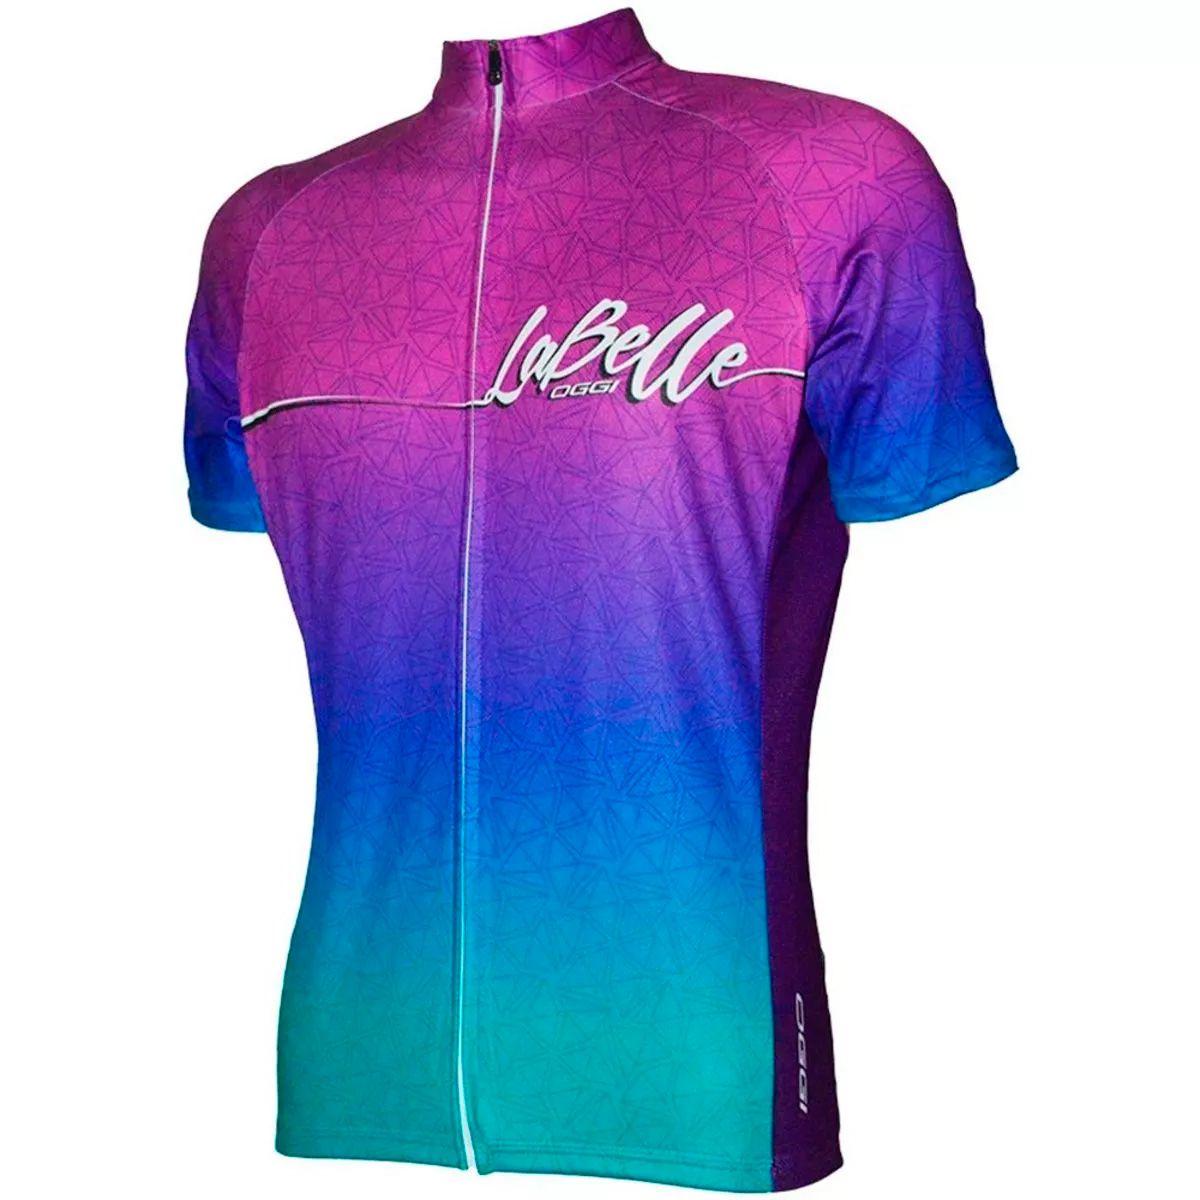 Camisa Ciclismo La Belle Feminina Oggi